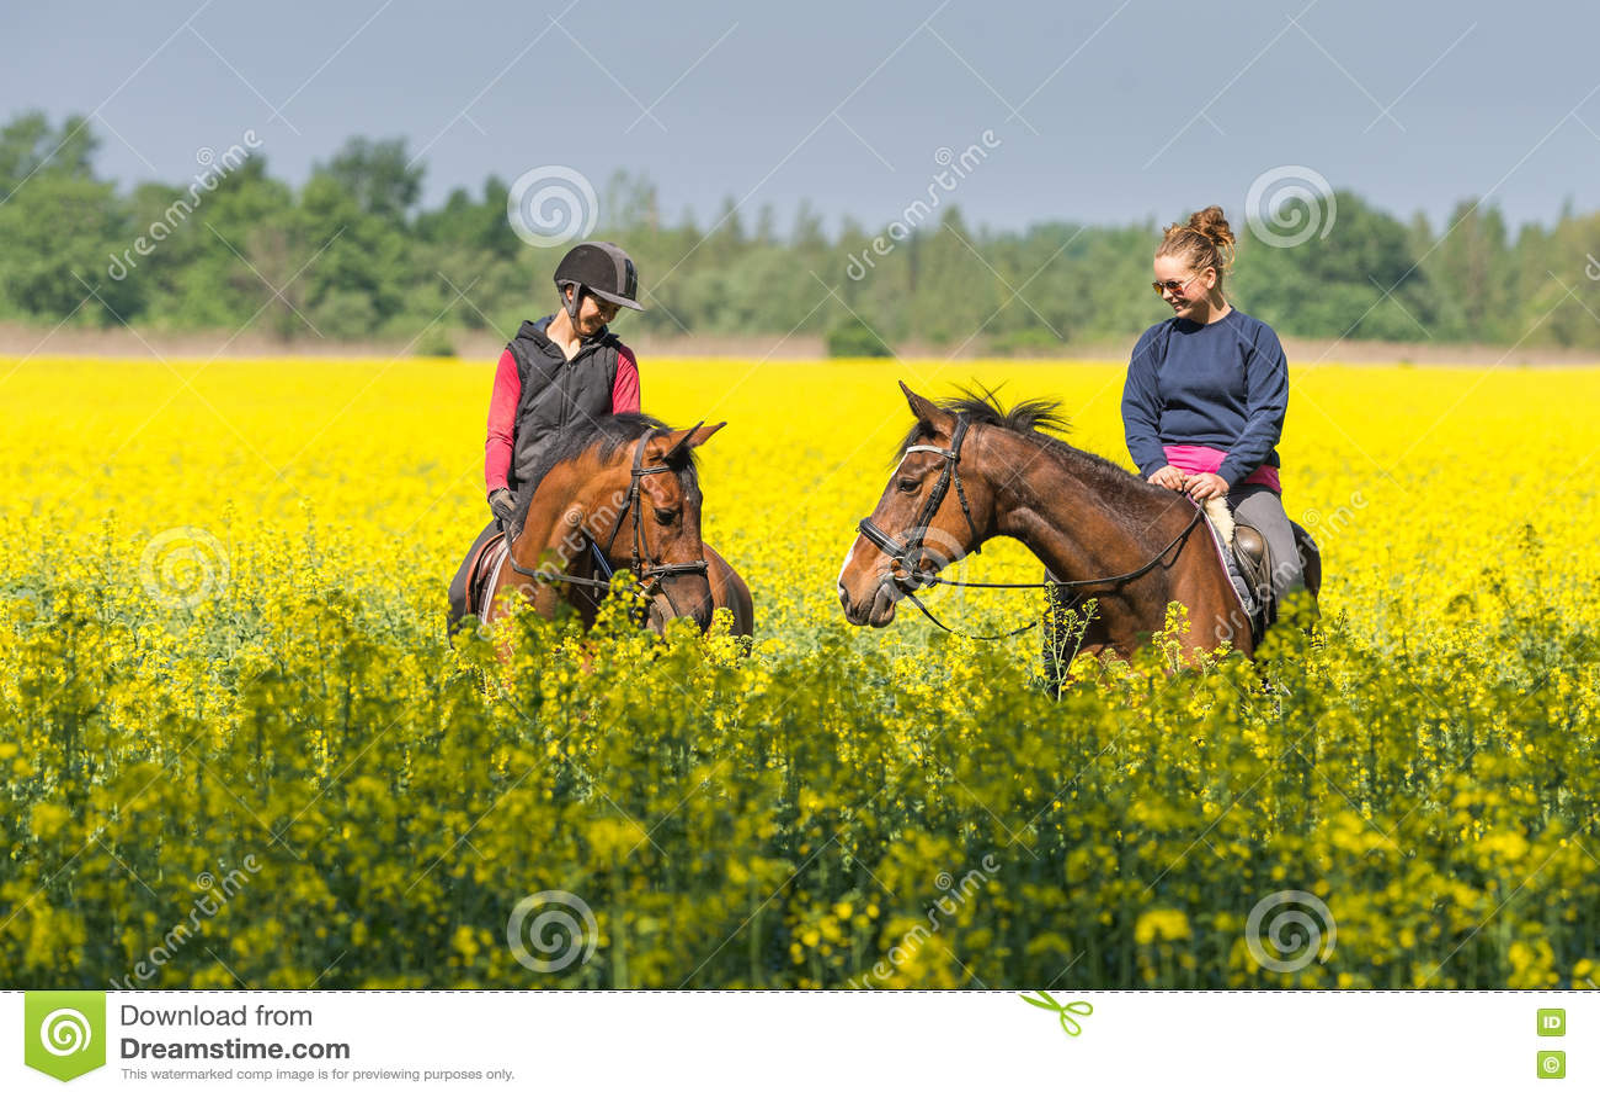 езды лошади девушки